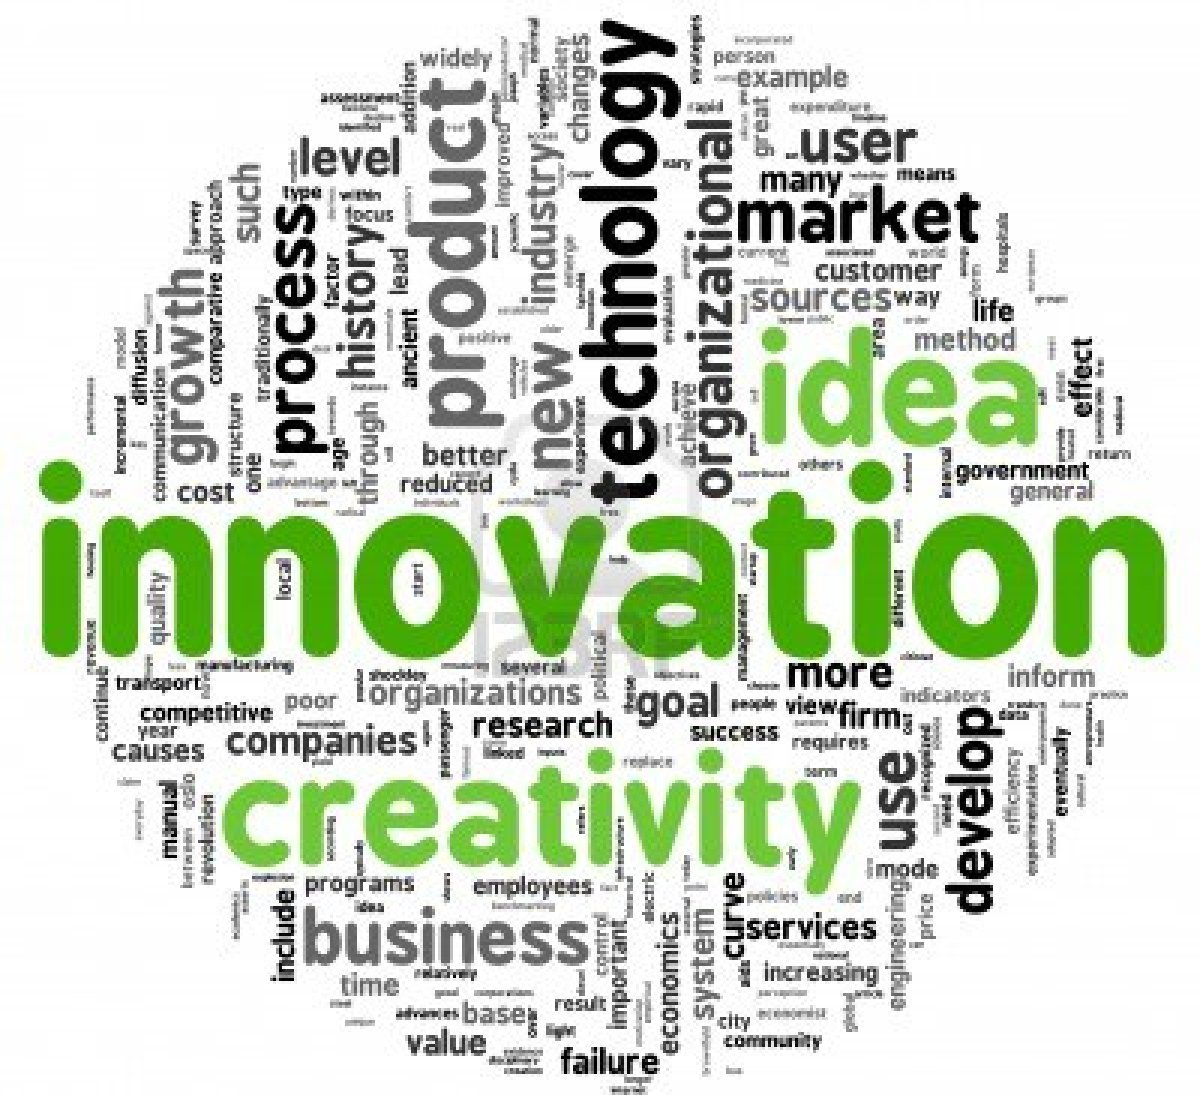 50 Business Ideas for Creative Entrepreneurs